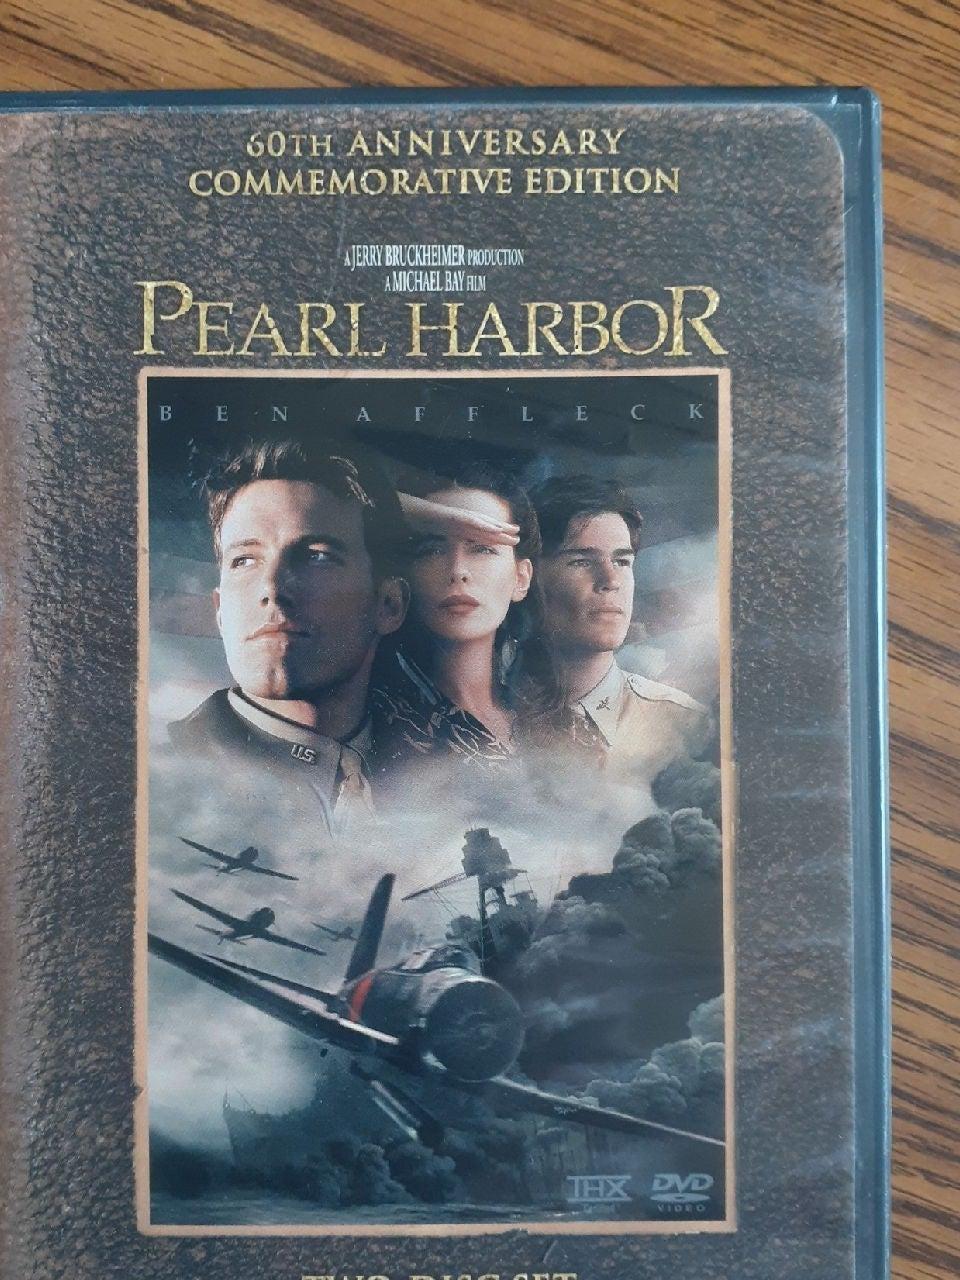 Pearl Harbor DVD 60th anniversary